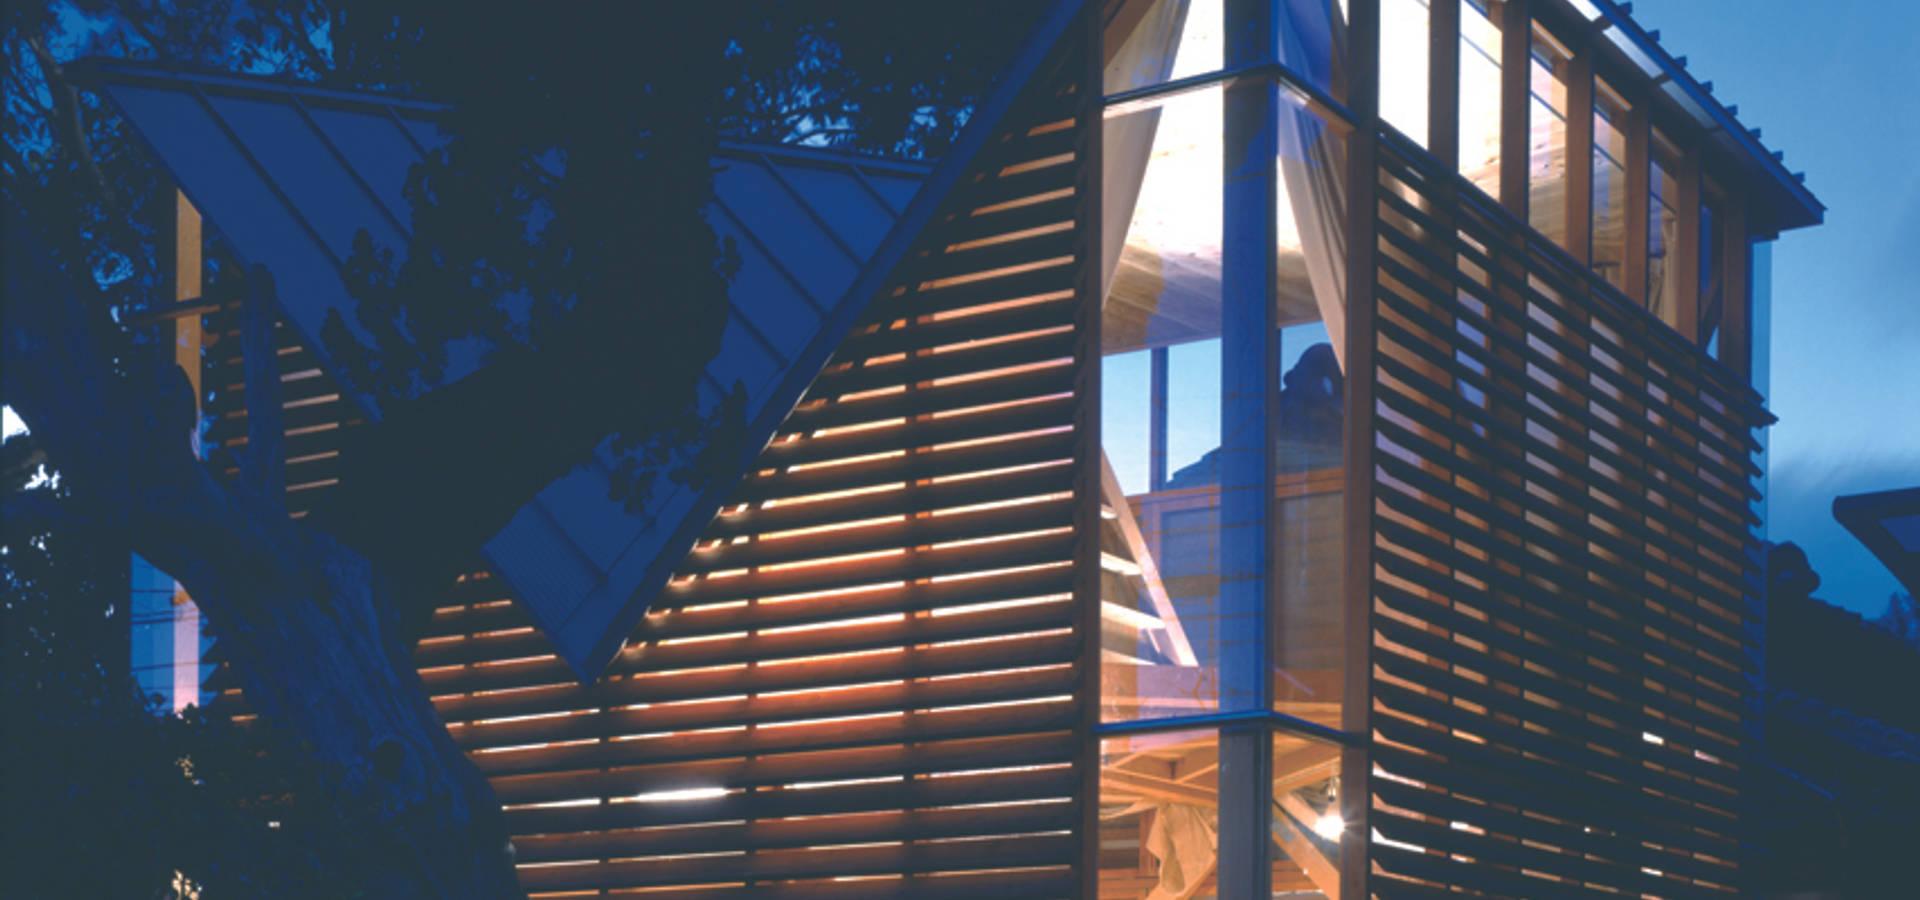 kaya+建築計画設計事務所